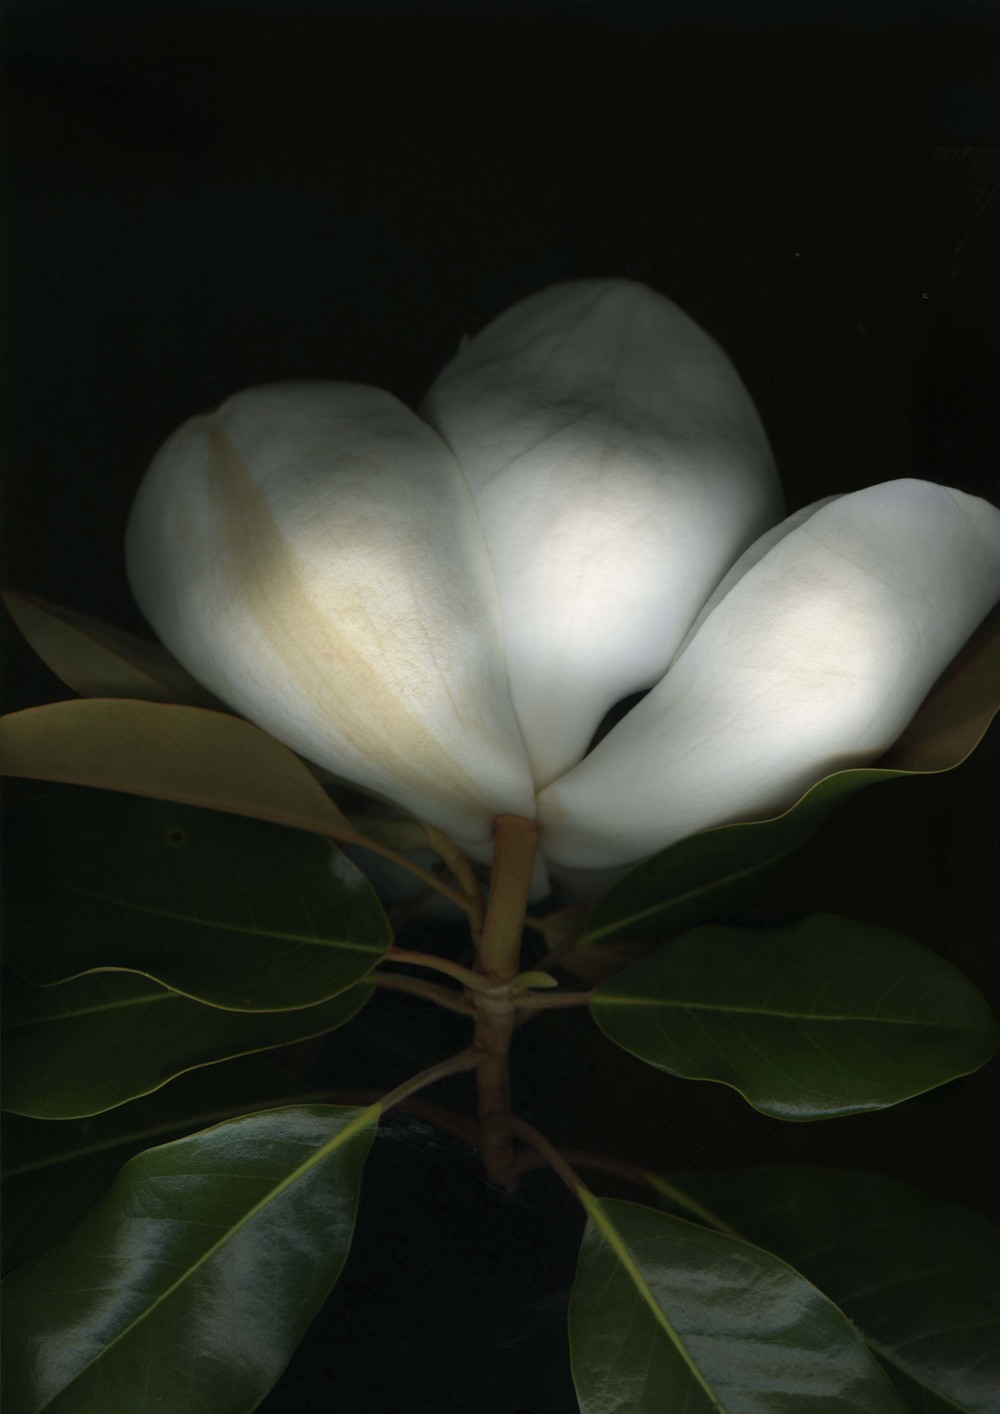 magnolia_3.jpg